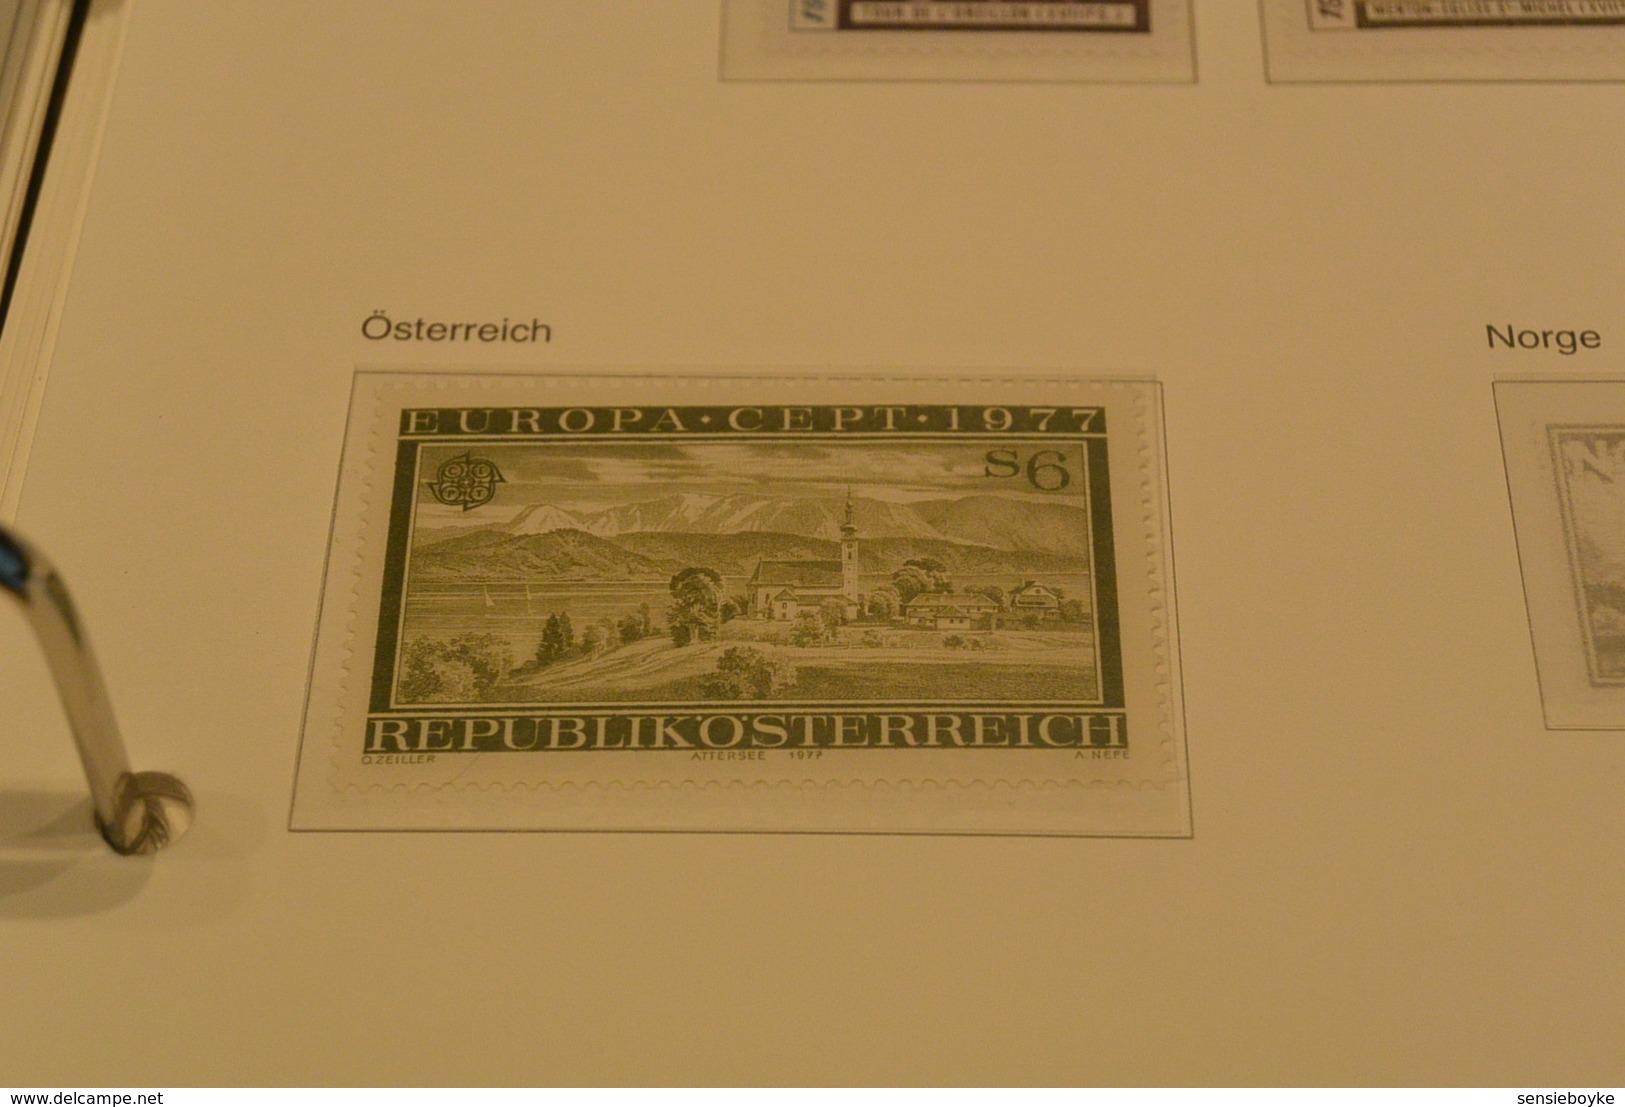 K22237 - Sets And Stamp  MNH Sweden-San Marino - Austria 1977  - CEPT - Europa - - Europa-CEPT